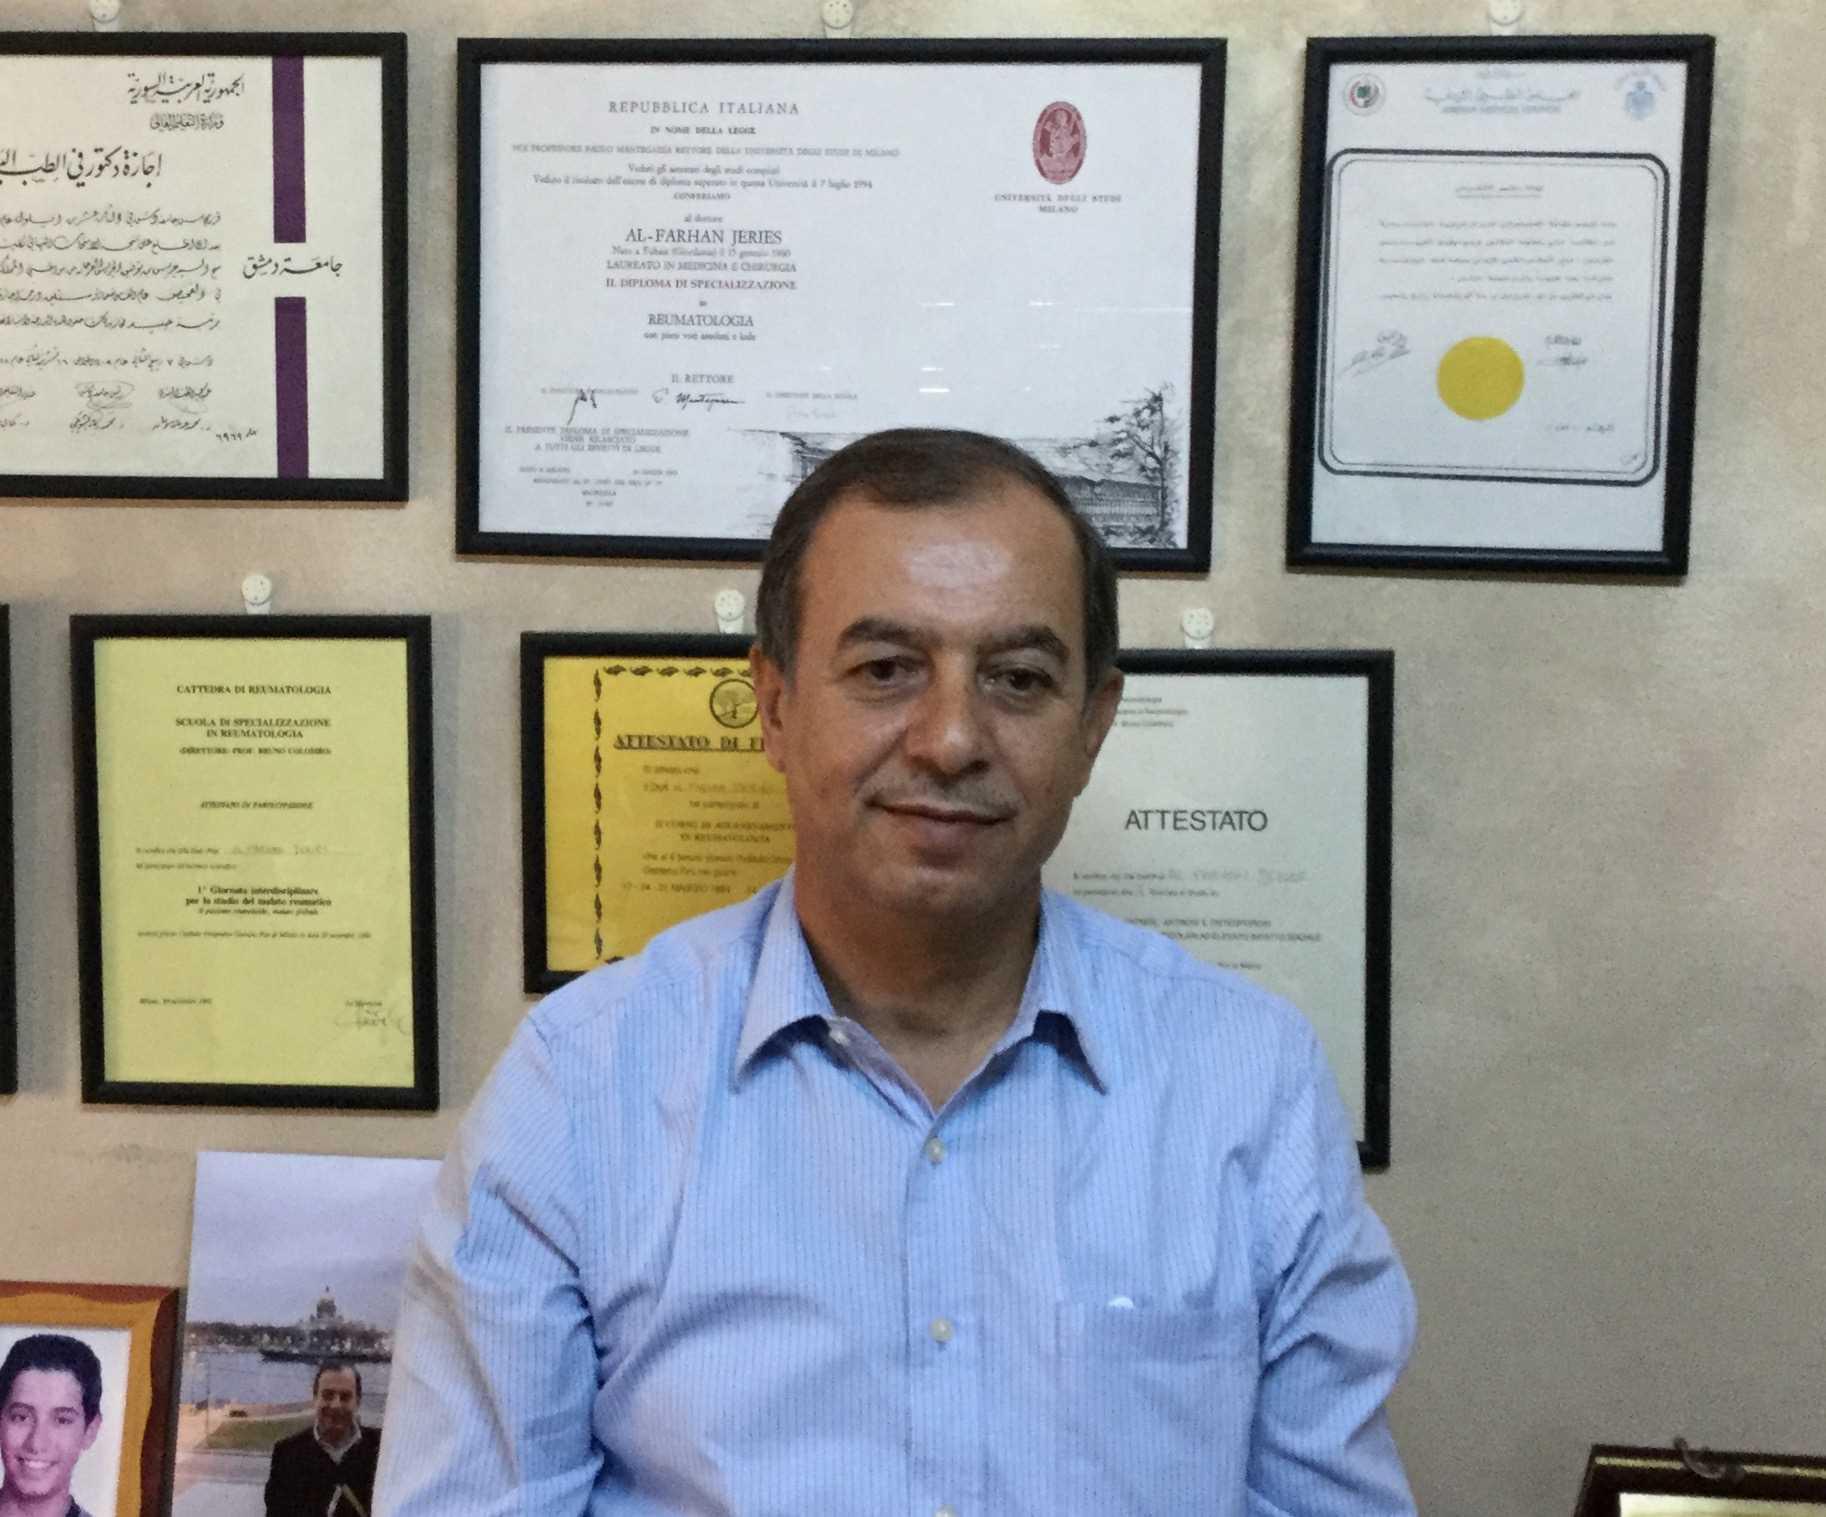 Doctor Geryes Daoud Rheumatologist | Vezeeta com